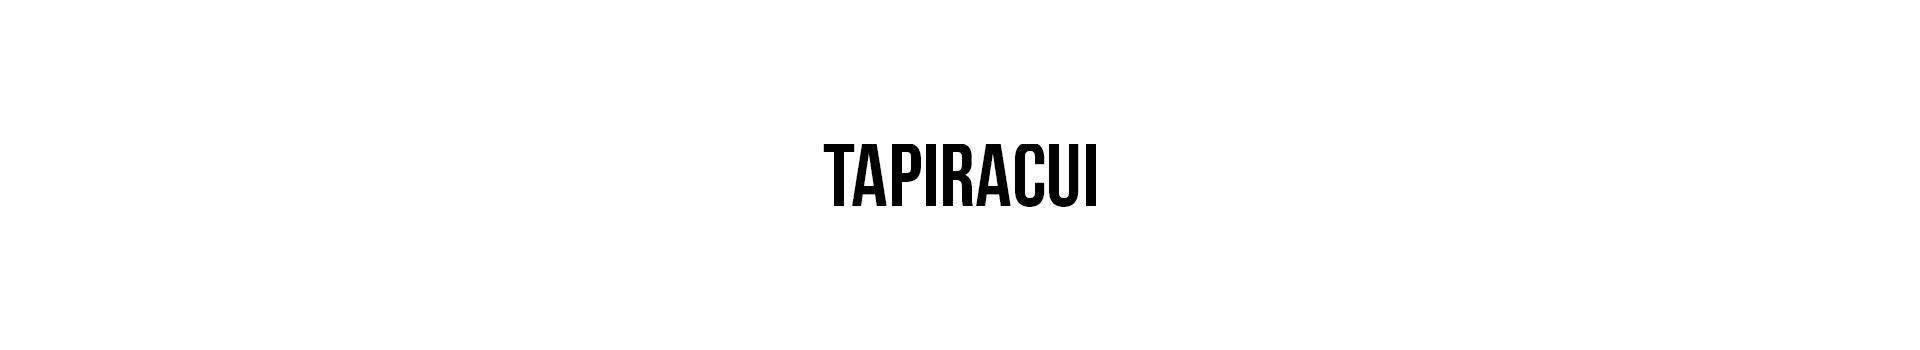 banner tapiracui